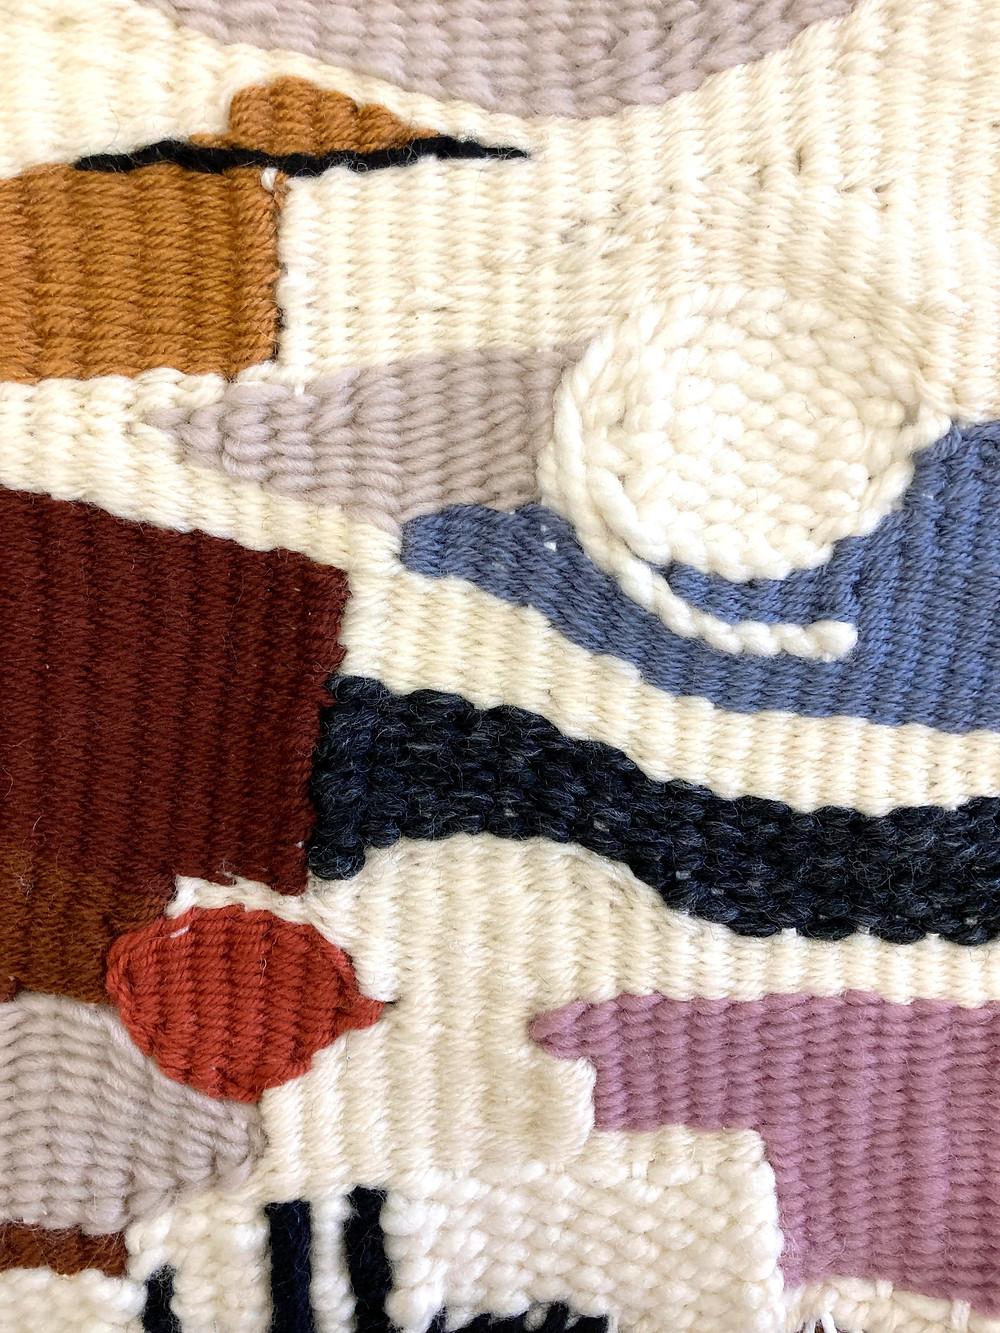 postmodern art abstract weaving